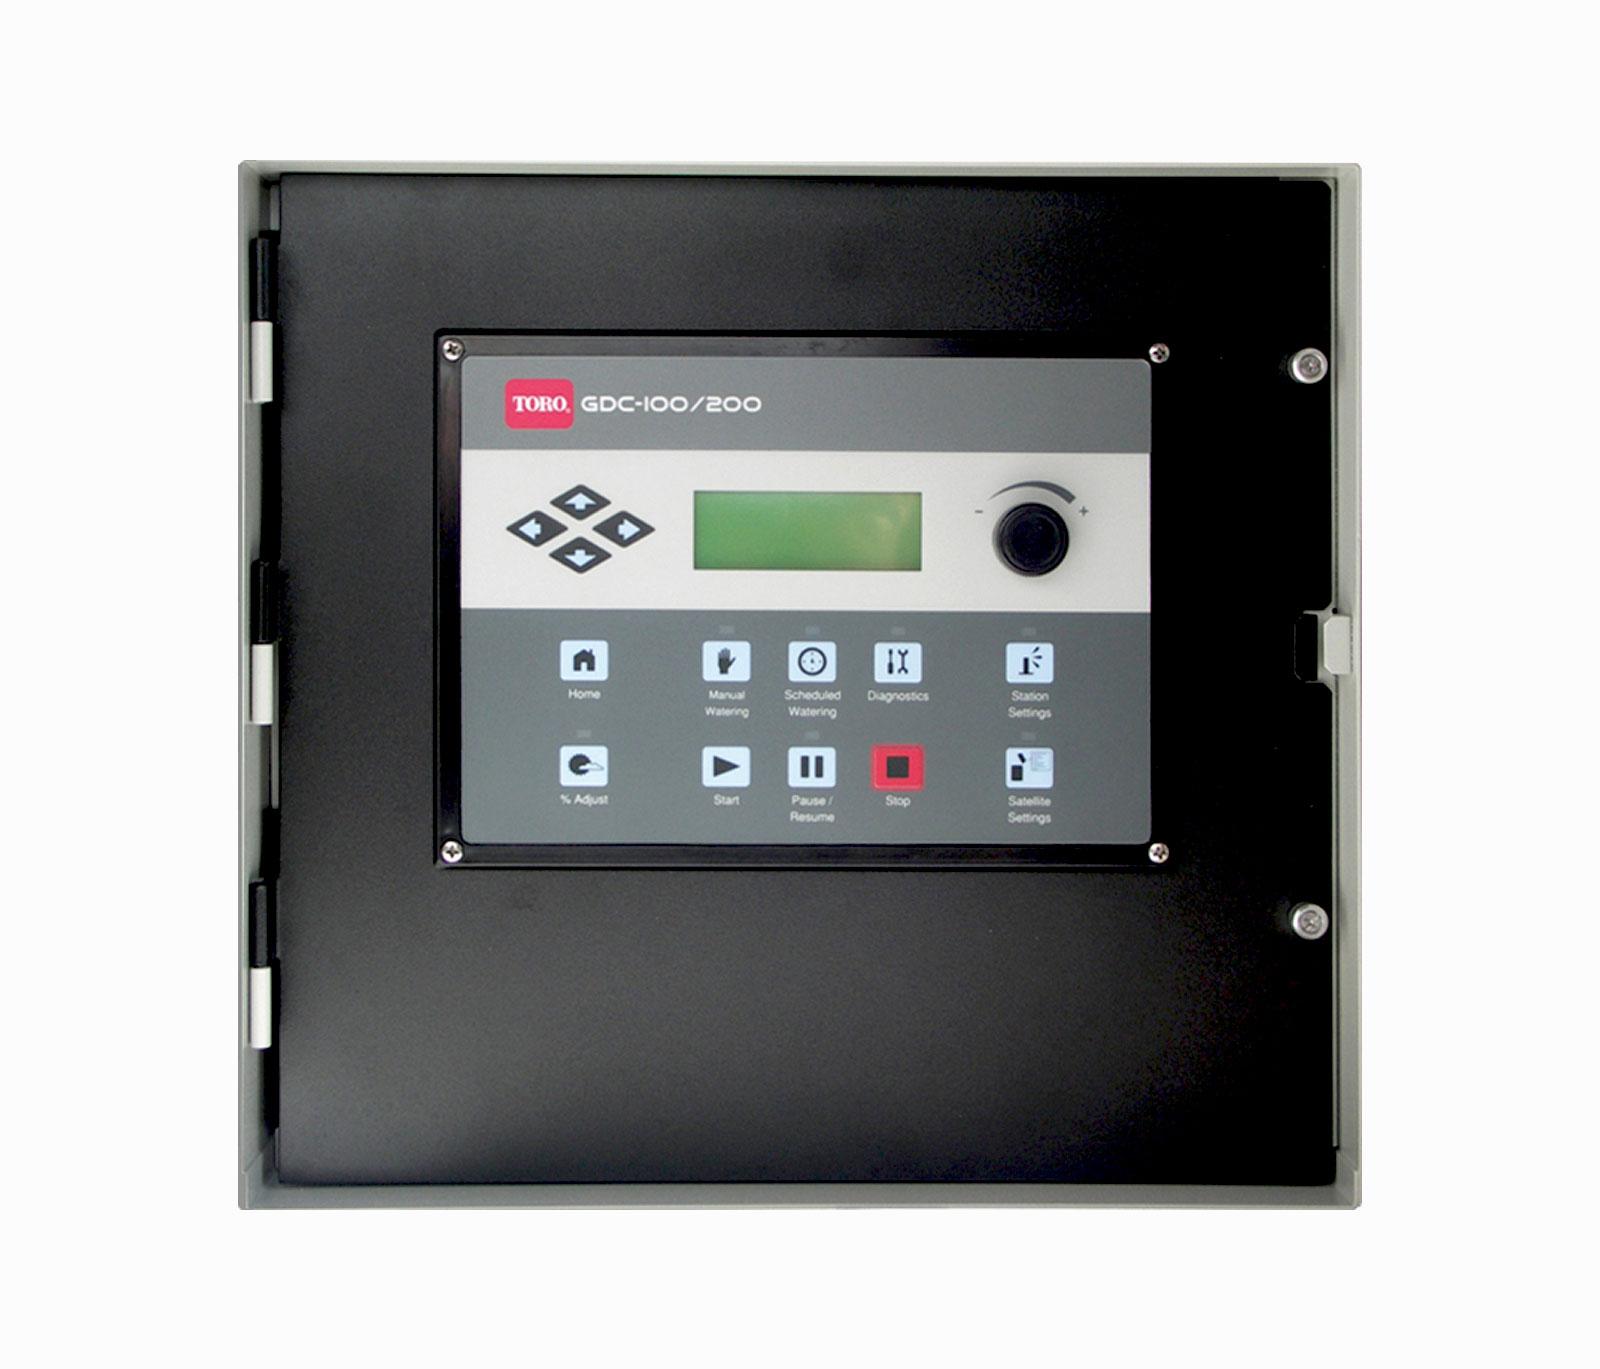 Toro Control Wiring Schematics Data Panel Color Code Gdc 2 Wire System Rh Com Electrical Basics Instrument